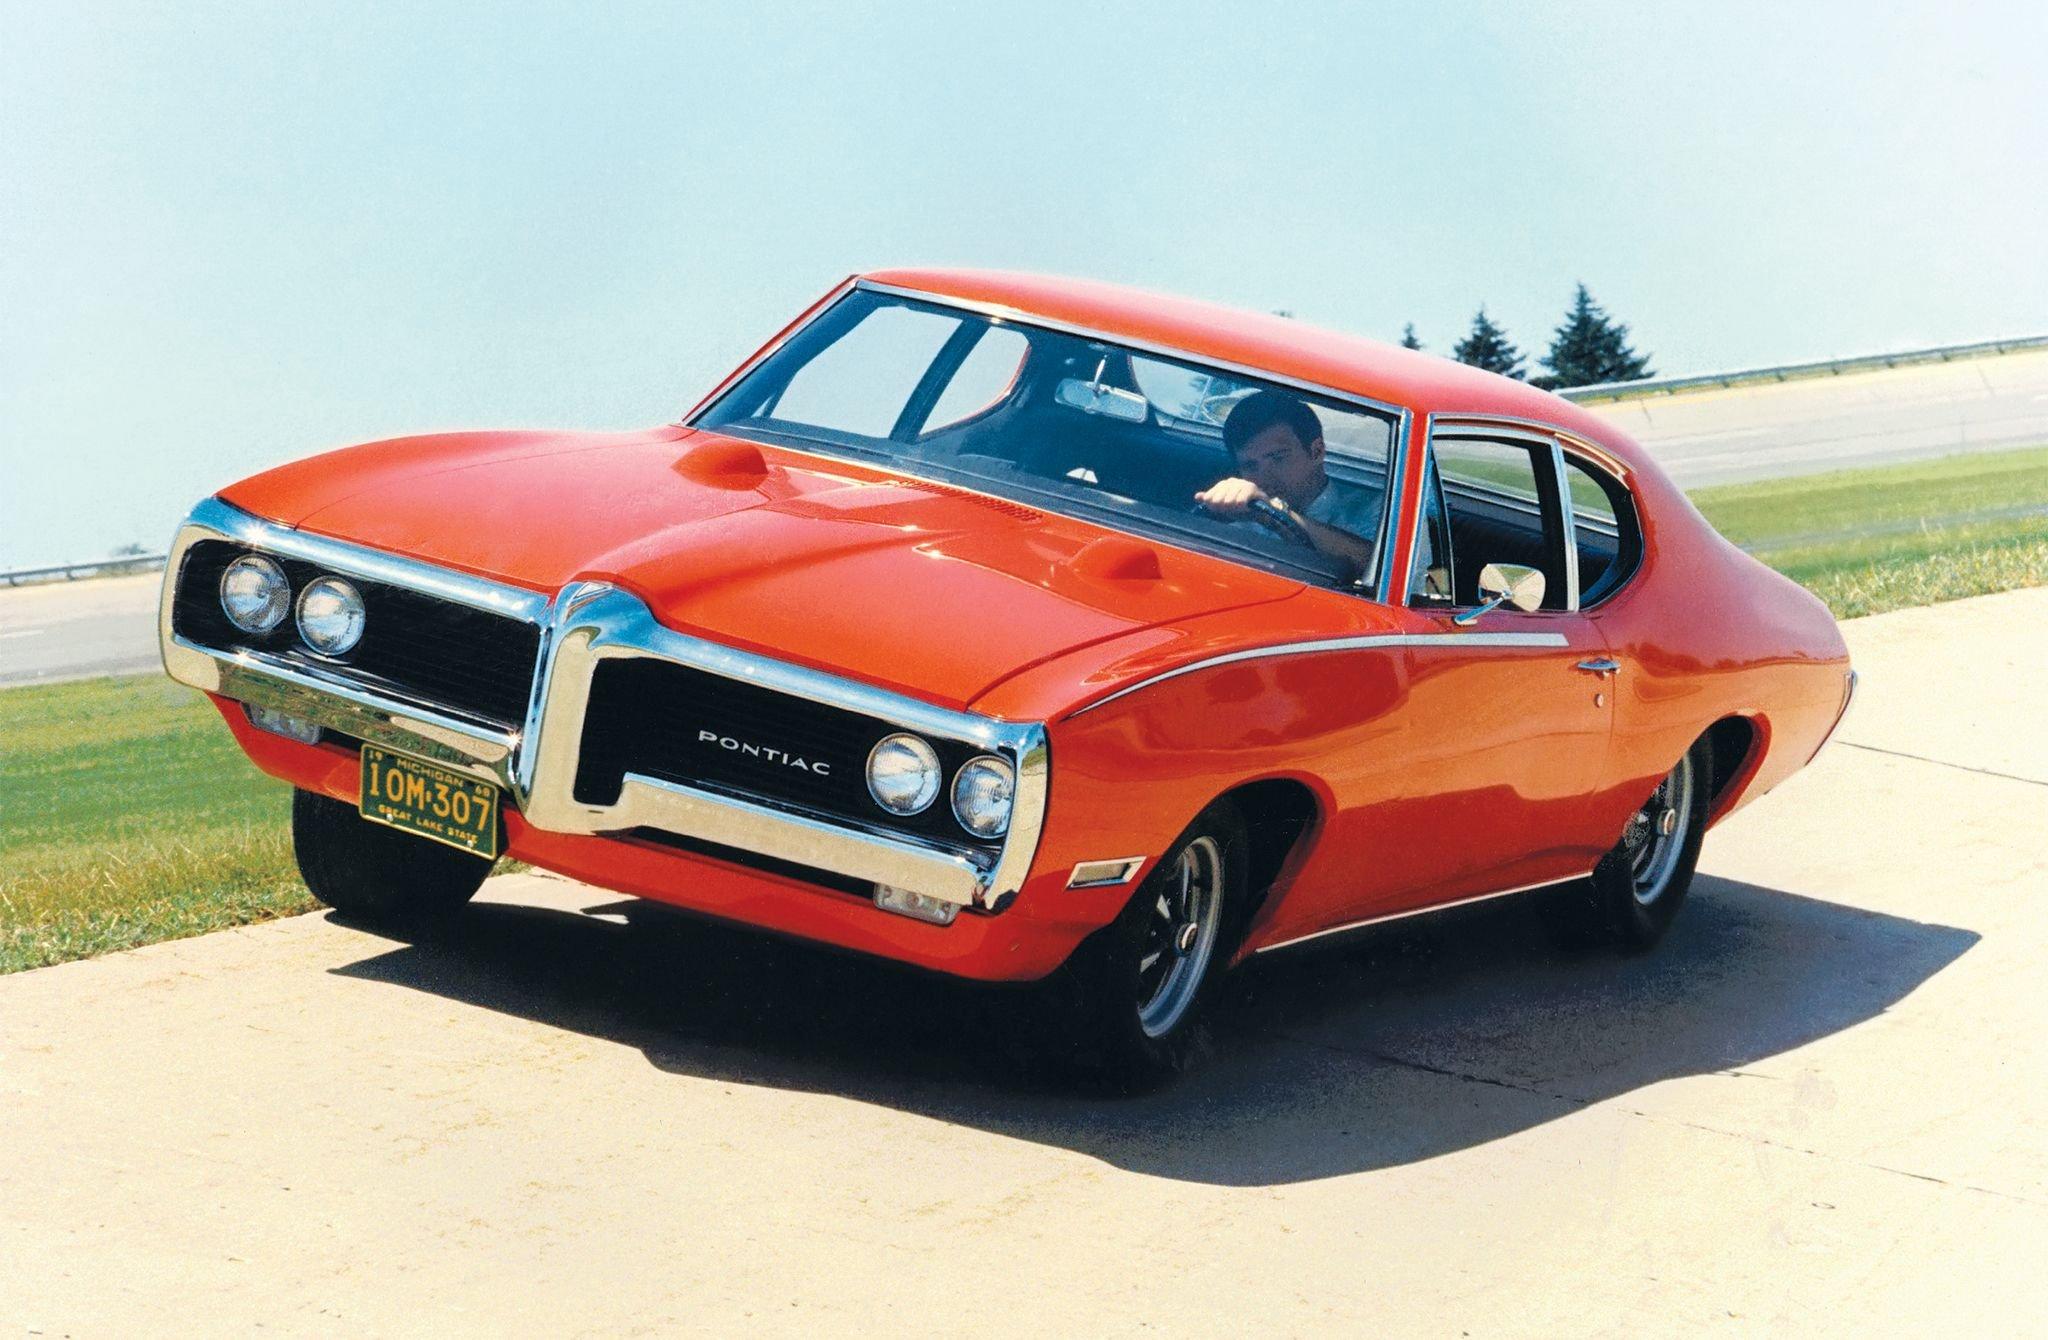 1968 Pontiac Grand Prix-01 wallpaper